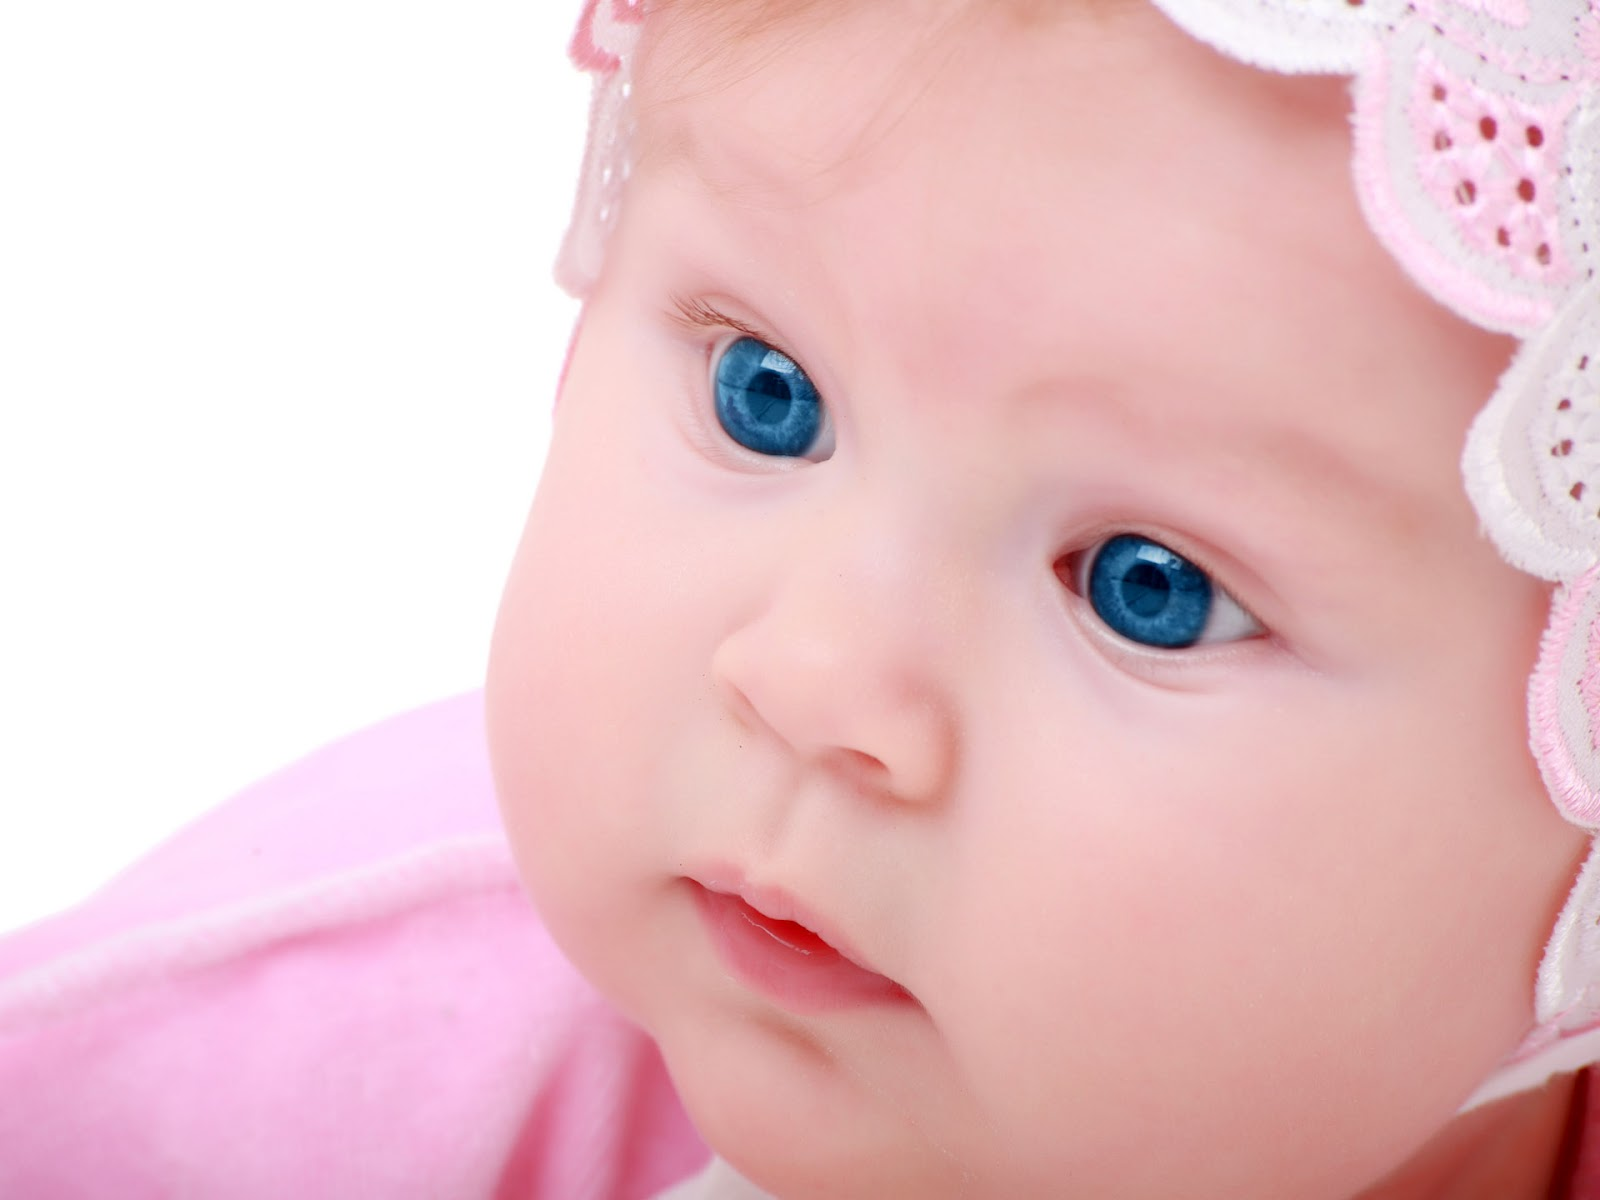 hd bebek resimleri rooteto+%252833%2529 30 En Güzel HD Kalite Bebek Resimleri moda_trend